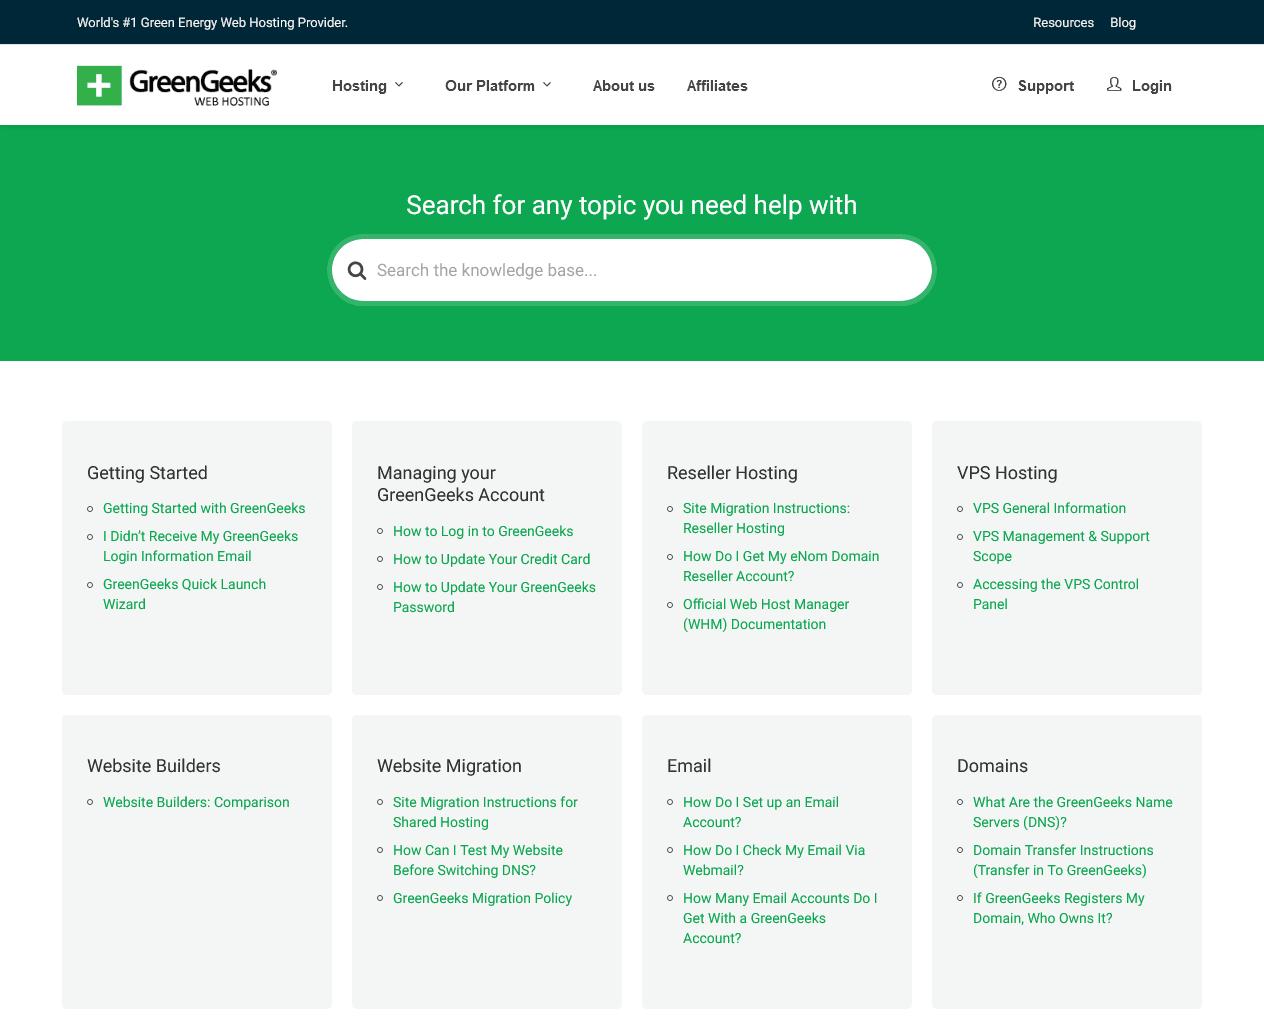 the GreenGeeks knowledge base